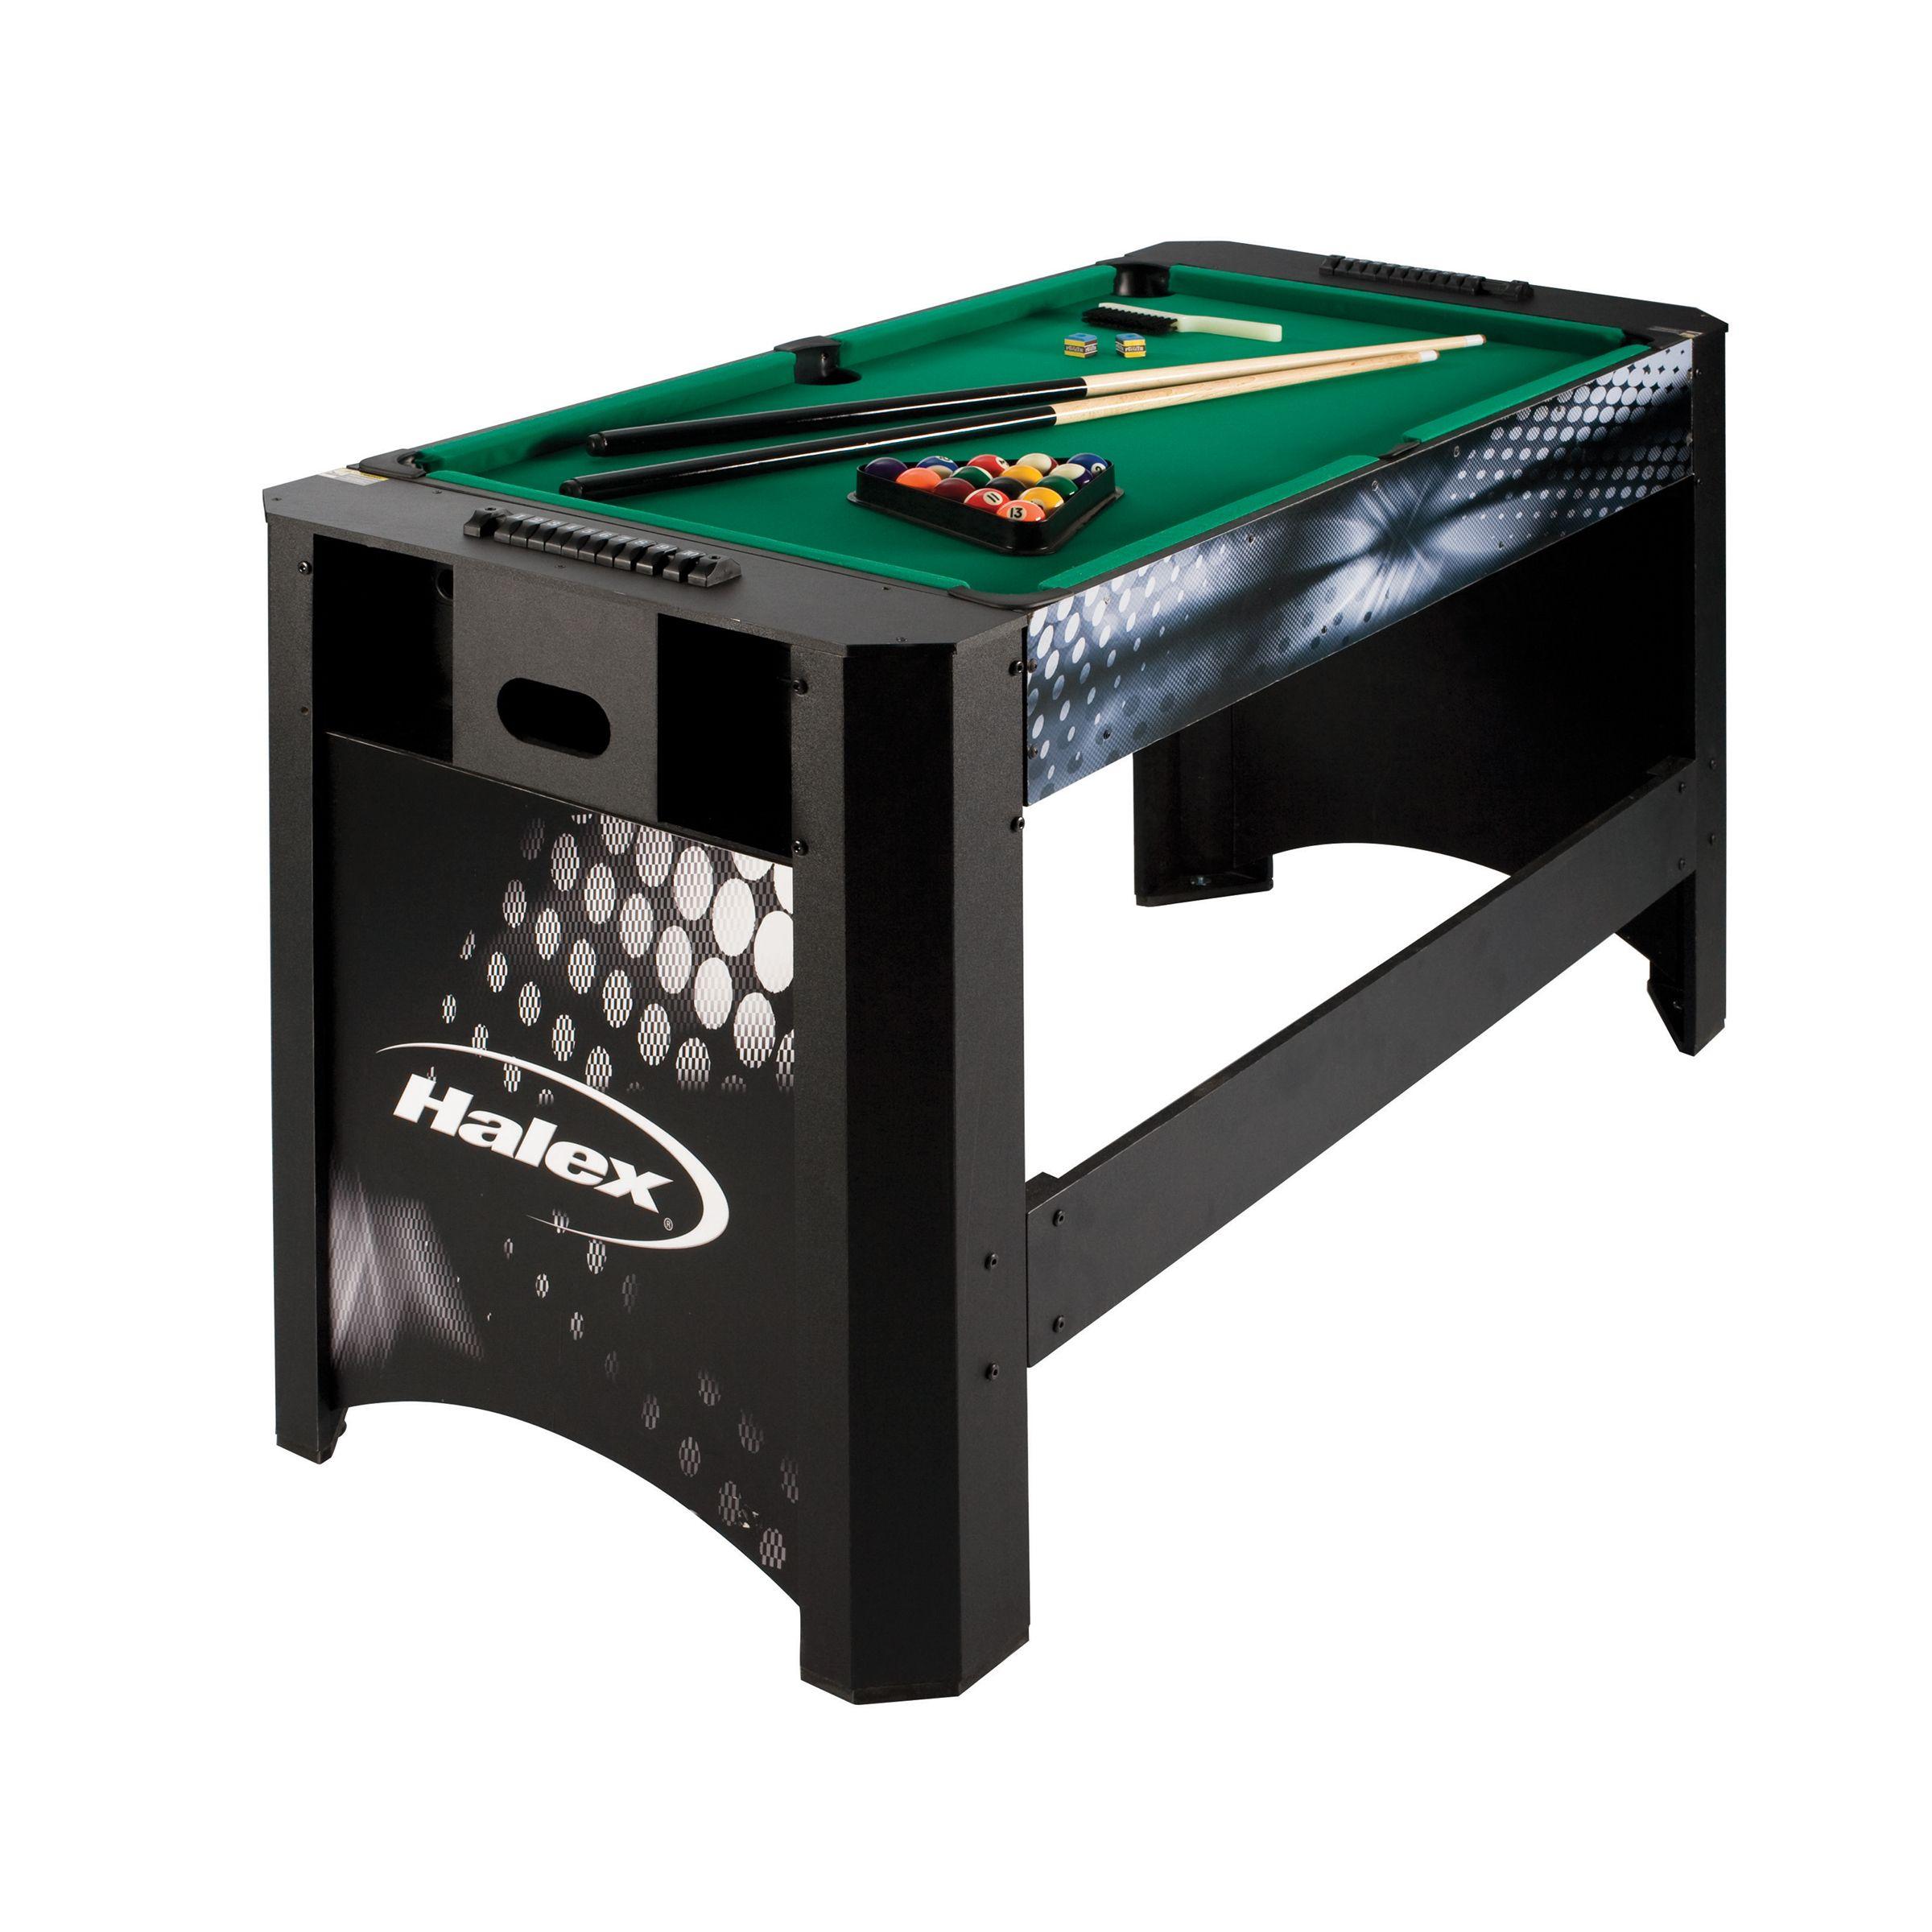 Halex 54in 4-in-1 Flip Table